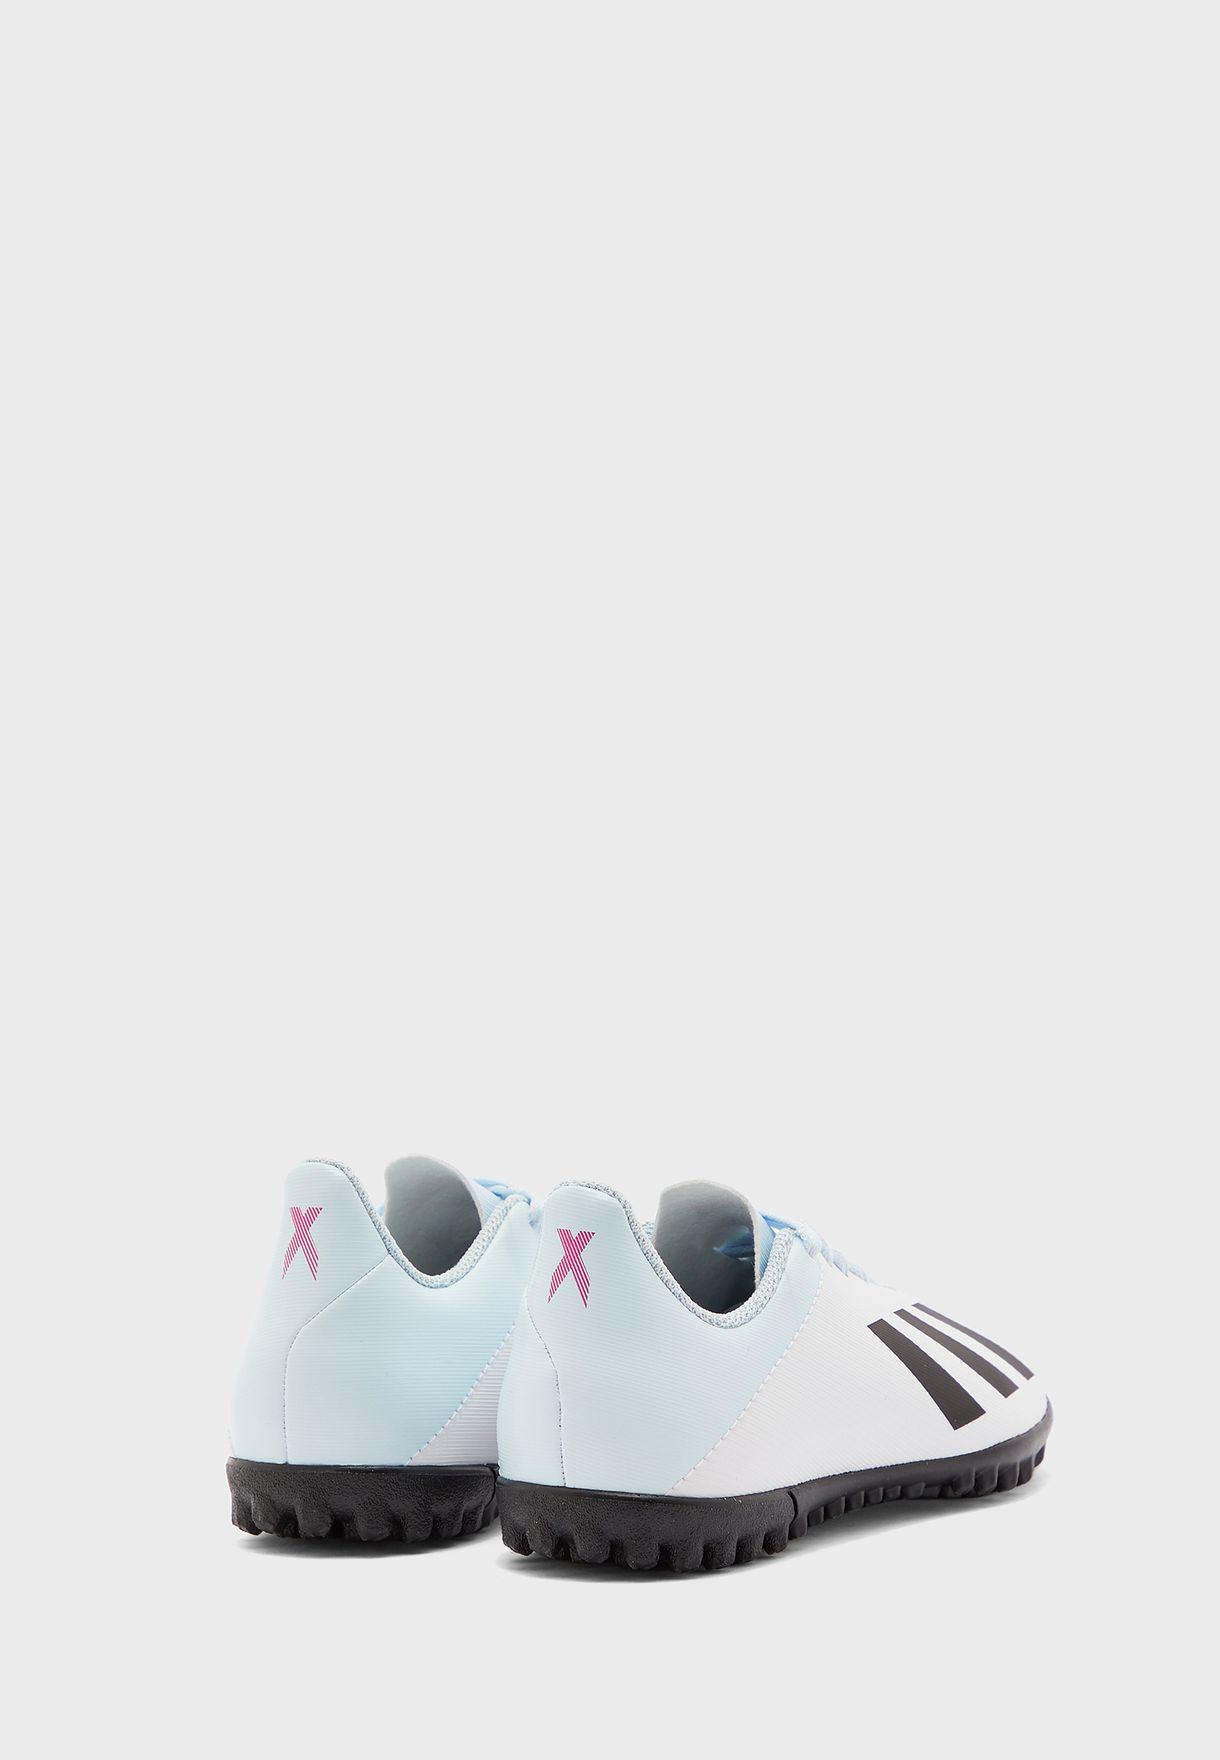 حذاء اكس 19.4 تي اف